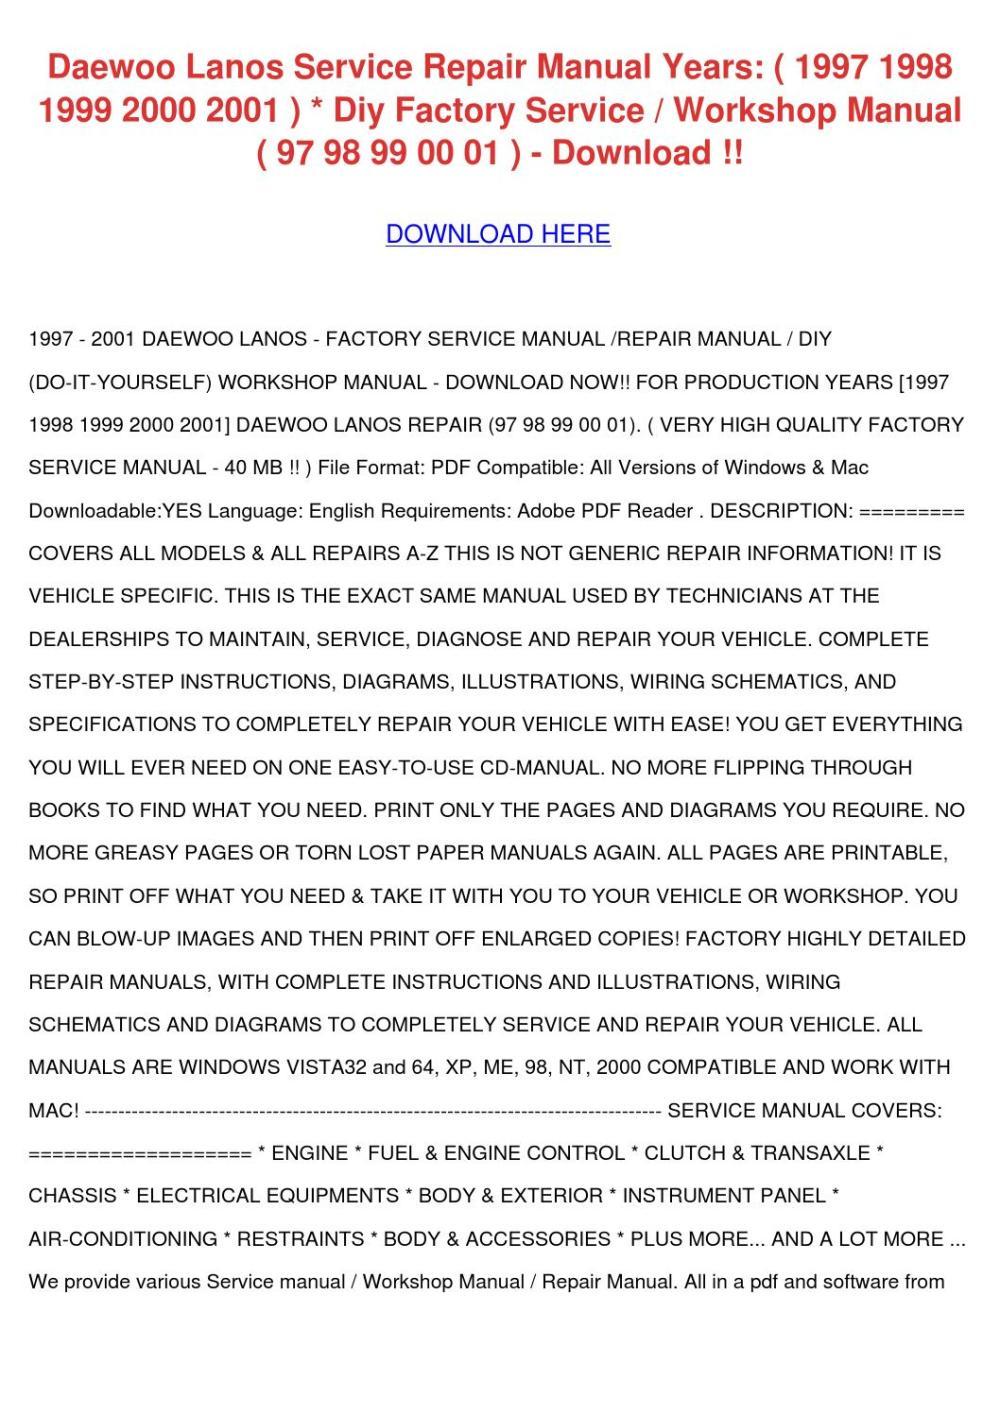 medium resolution of daewoo lanos service repair manual years 1997 by bruceanthony issuu daewoo lacetti stereo wiring diagram